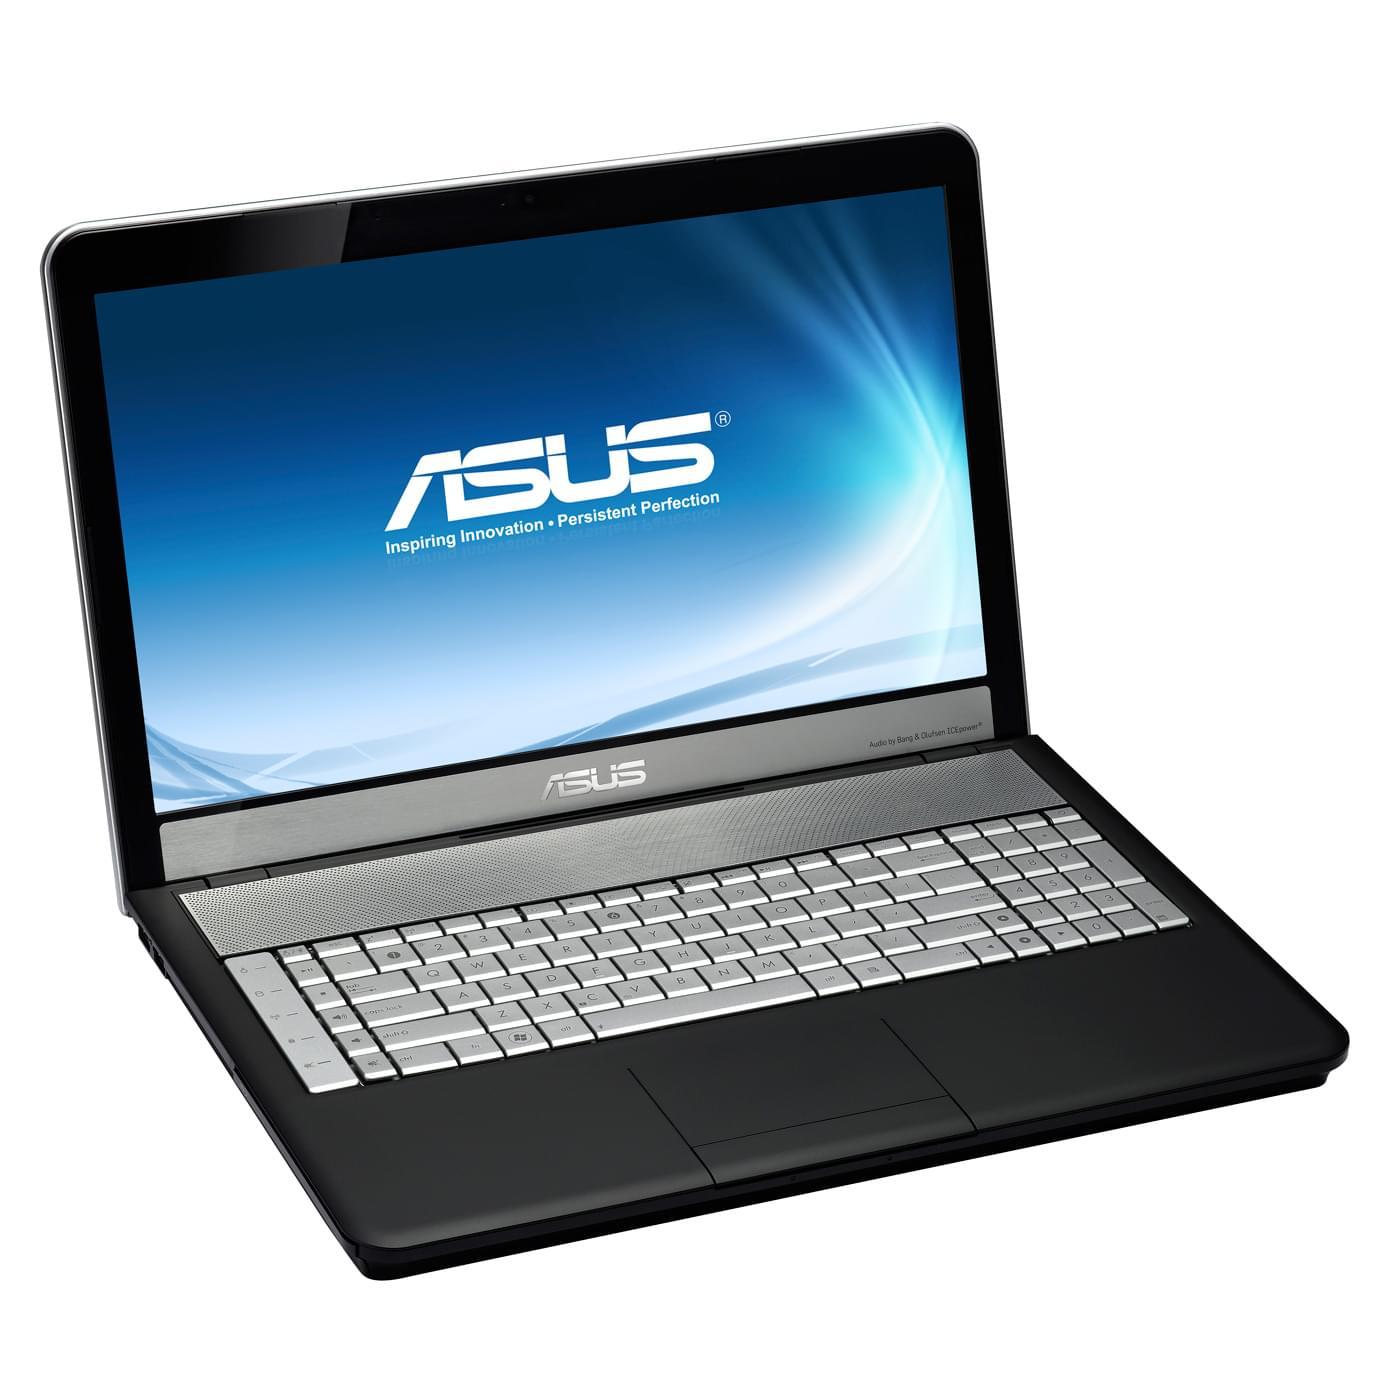 Asus N75SL-V2G-TY089V (N75SL-V2G-TY089V) - Achat / Vente PC portable sur Cybertek.fr - 0